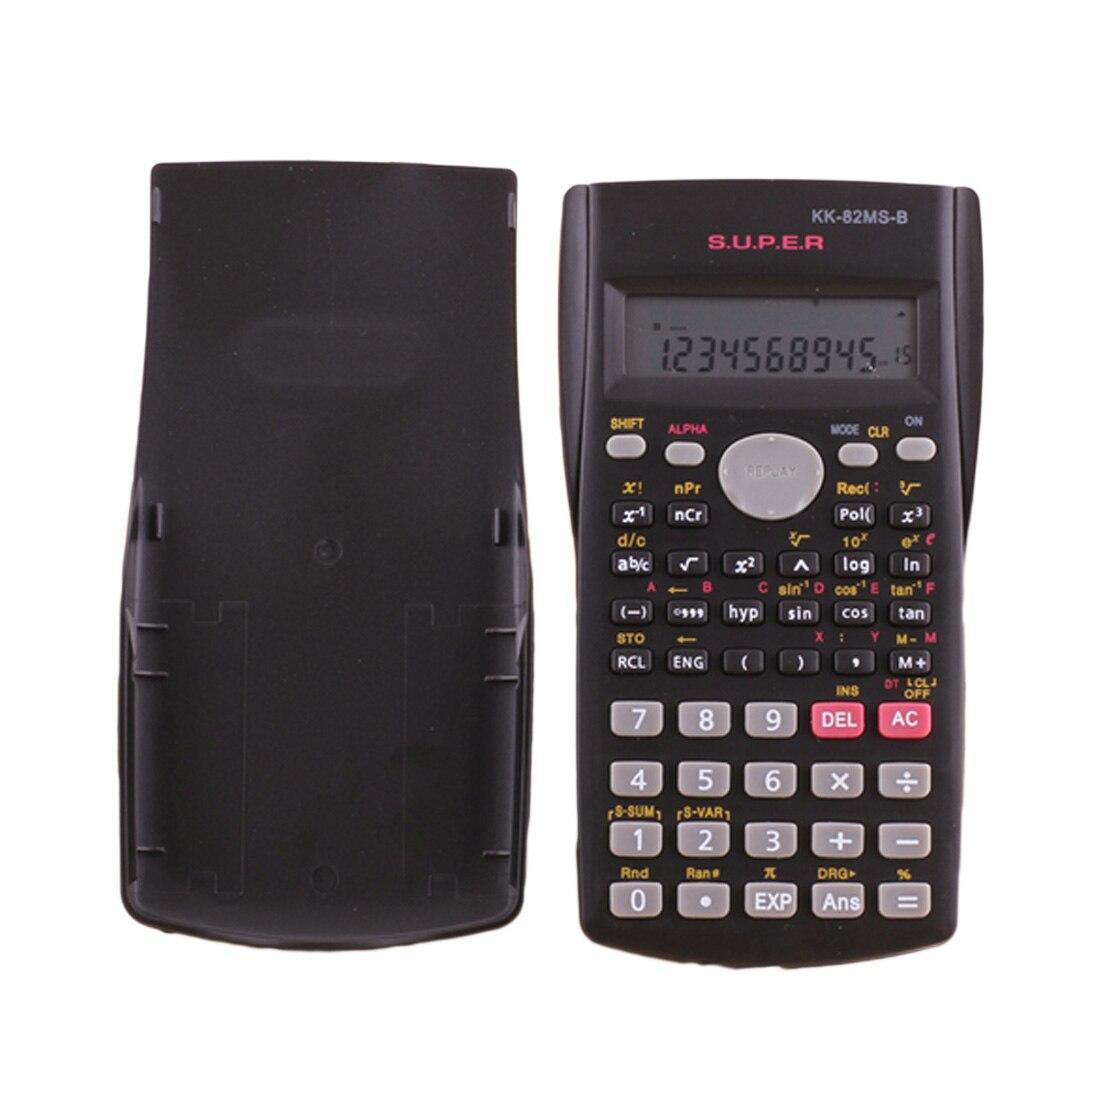 NOYOKERE 100% yeni fonksiyon hesap makinesi el çok fonksiyonlu 2 Line ekran  dijital LCD bilimsel hesap toptan|scientific calculator|function  calculatorcalculator functions - AliExpress